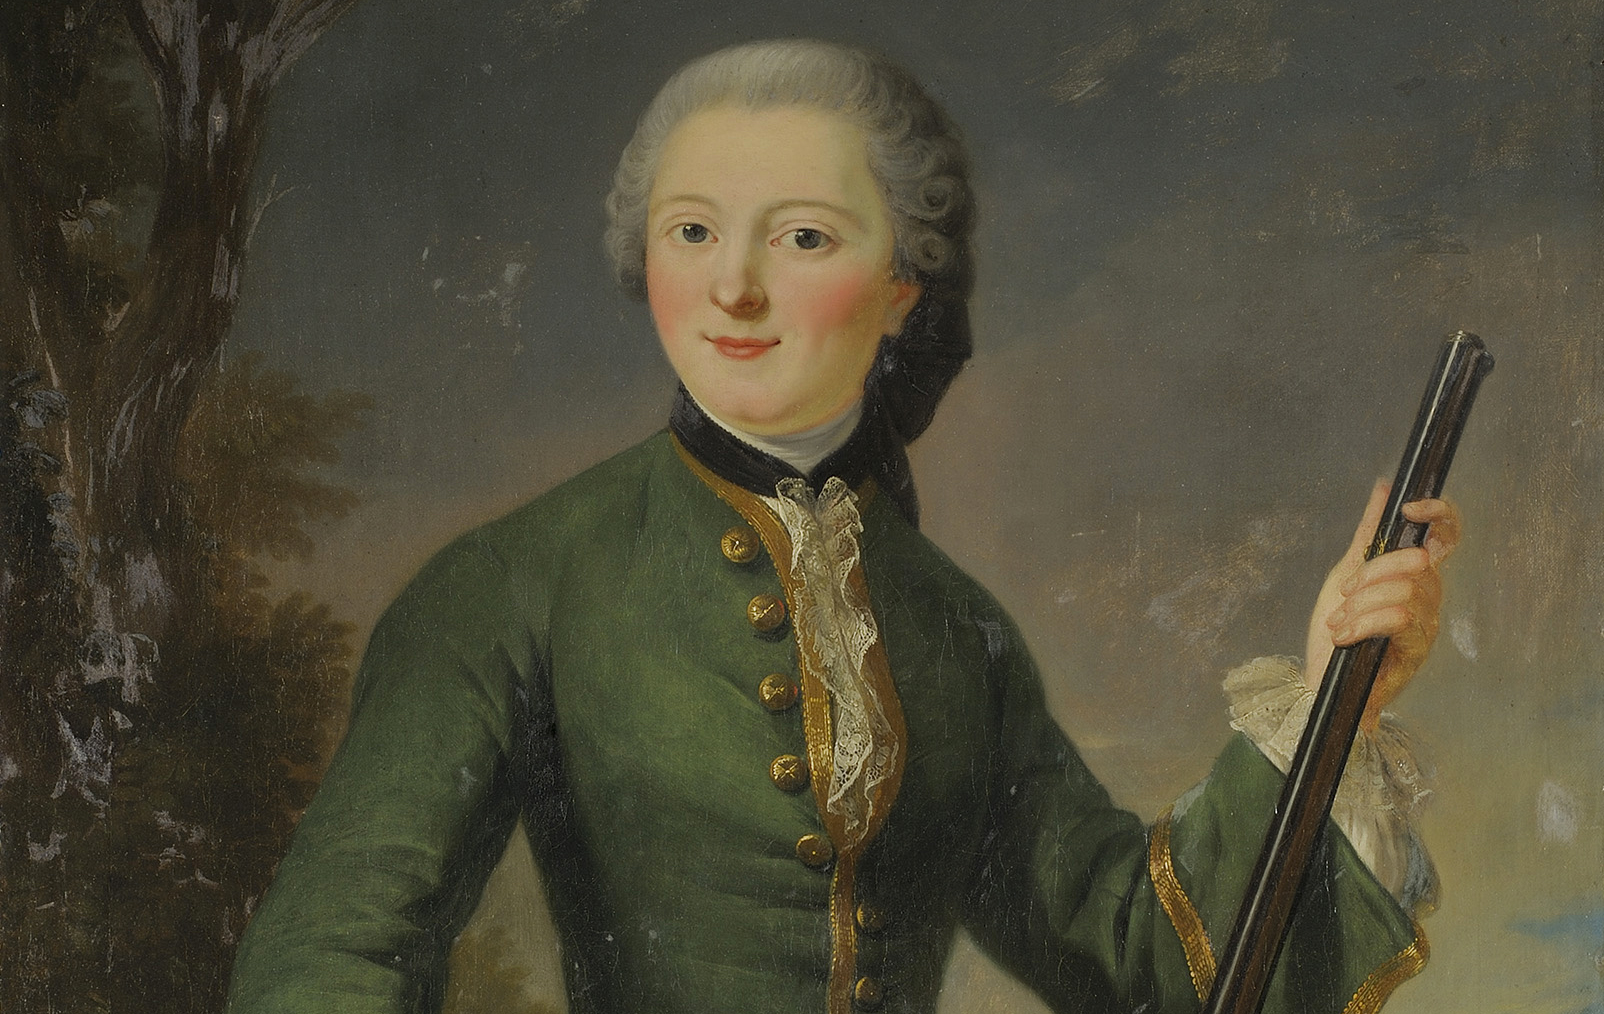 Ritratto della Mademoiselle de Charolais, principessa Louise Anne de Bourbon-Condé (Versailles 1695 – Paris 1758)